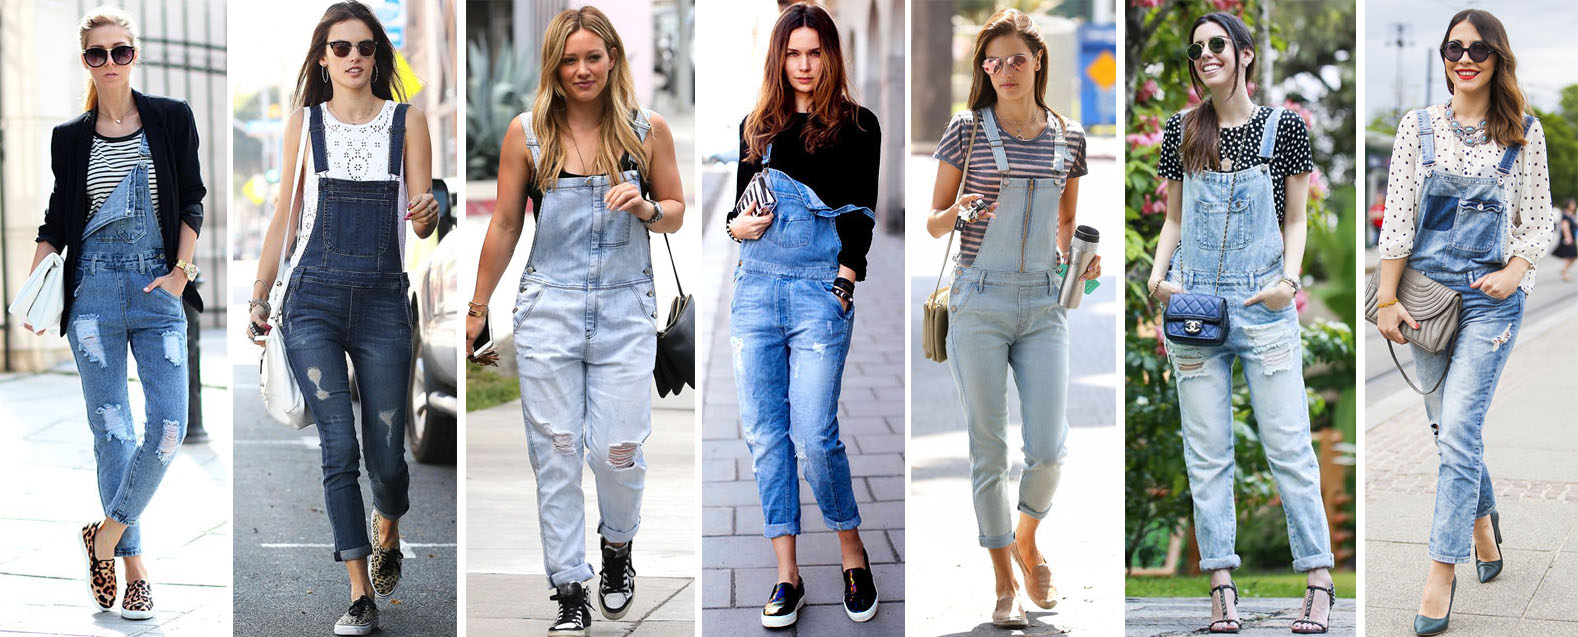 blog-discutindo-moda-tendencia-primavera-verao-2016-boho-chic-gypsy-macacao-jeans-anos-70-barra-dobrada